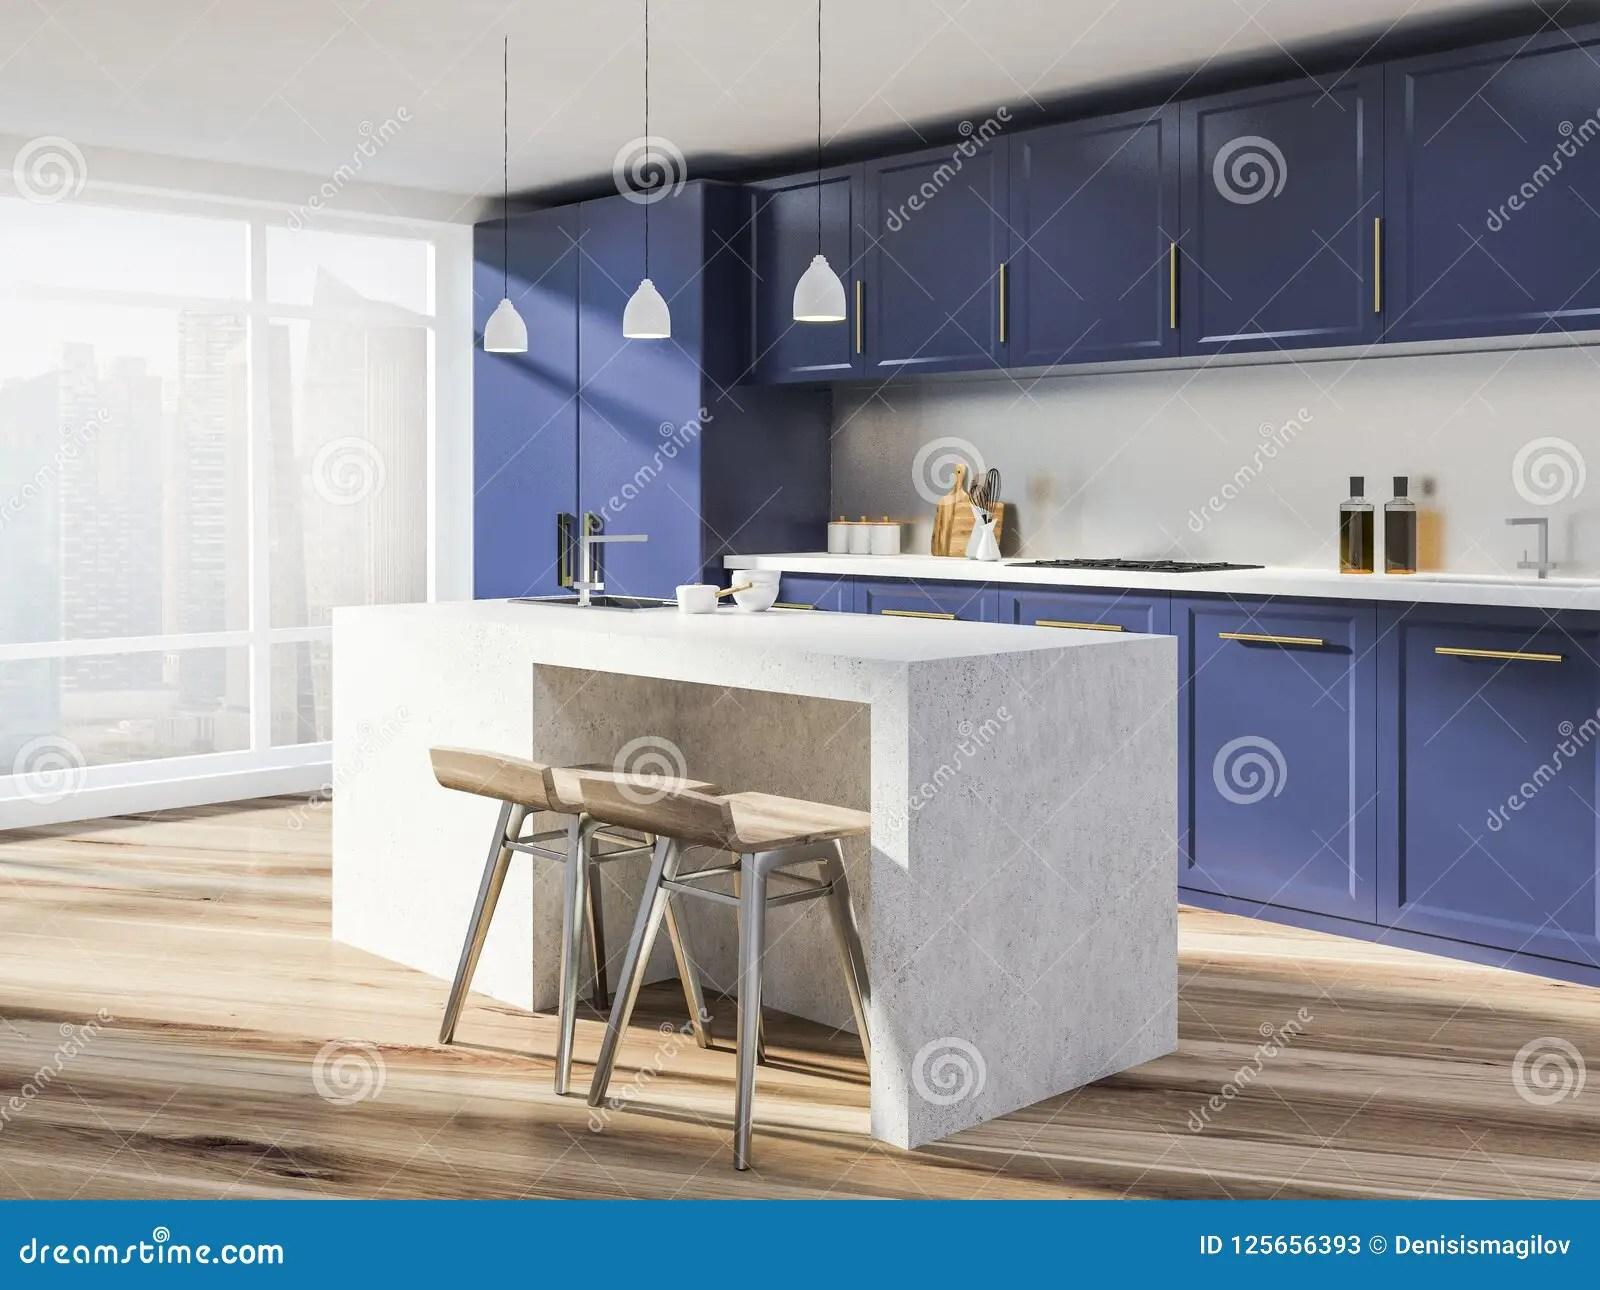 corner hutch kitchen updated ideas 紫色工作台面厨房角落 酒吧库存例证 插画包括有消耗大 房子 属性 与白色墙壁的全景厨房内部 木地板 紫色工作台面和碗柜和一个石海岛有凳子的3d翻译拷贝空间